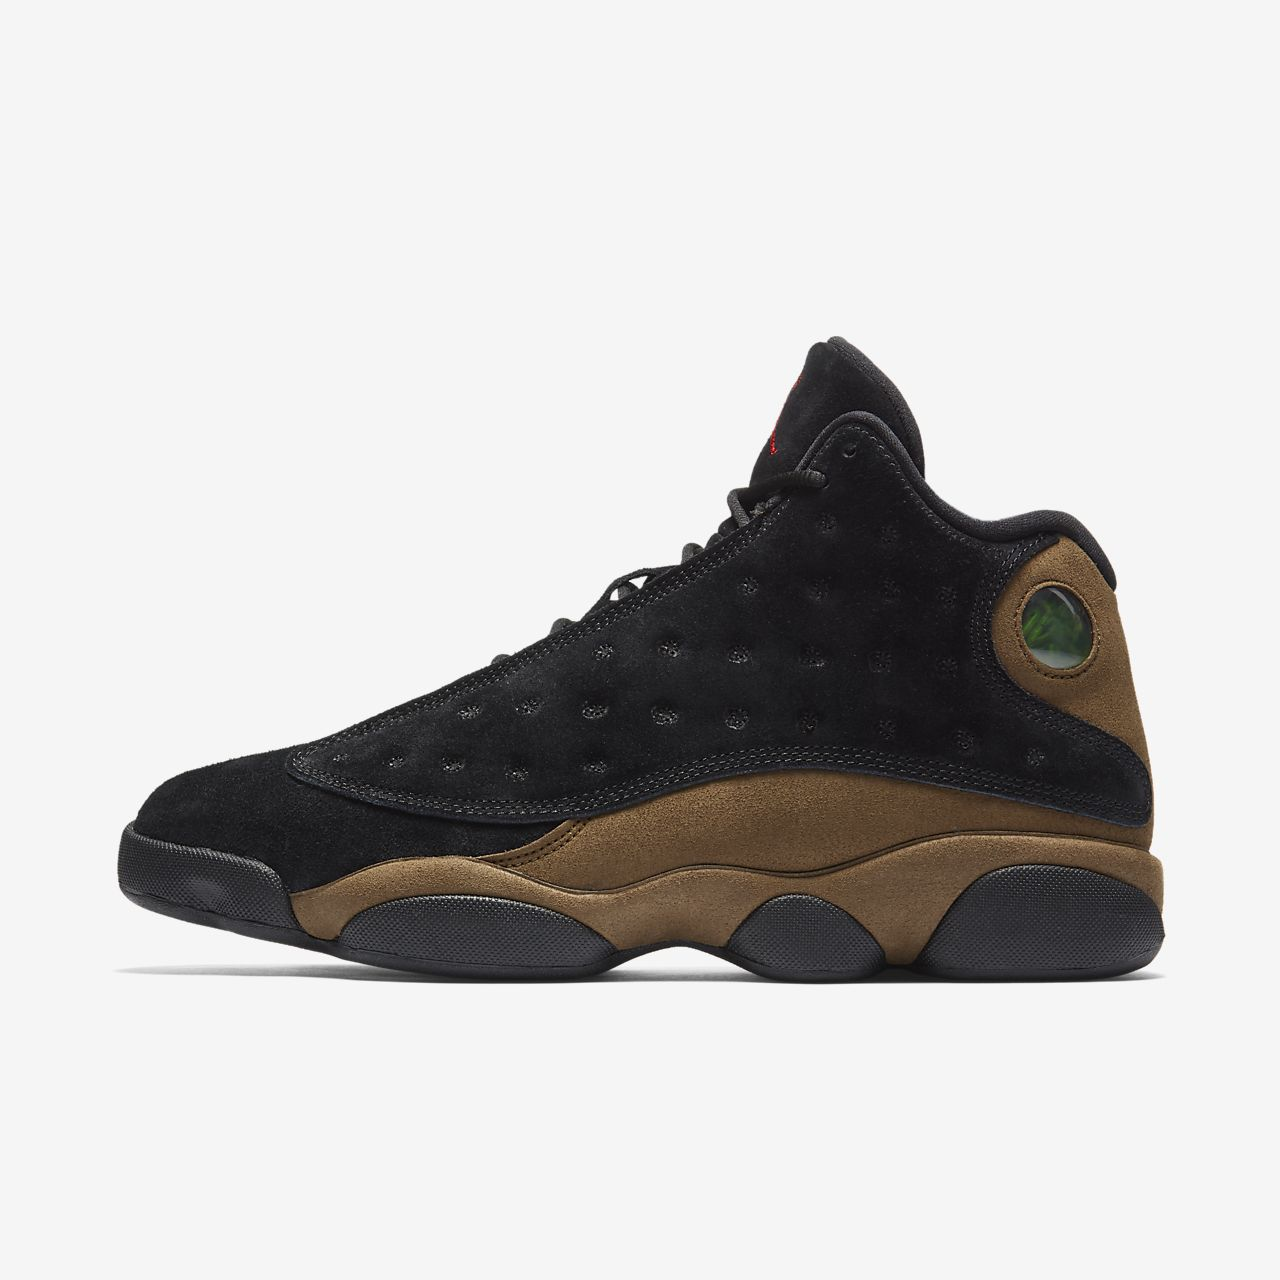 Chaussures Jordan Brand Classic noires homme fpGVpwQ6Td